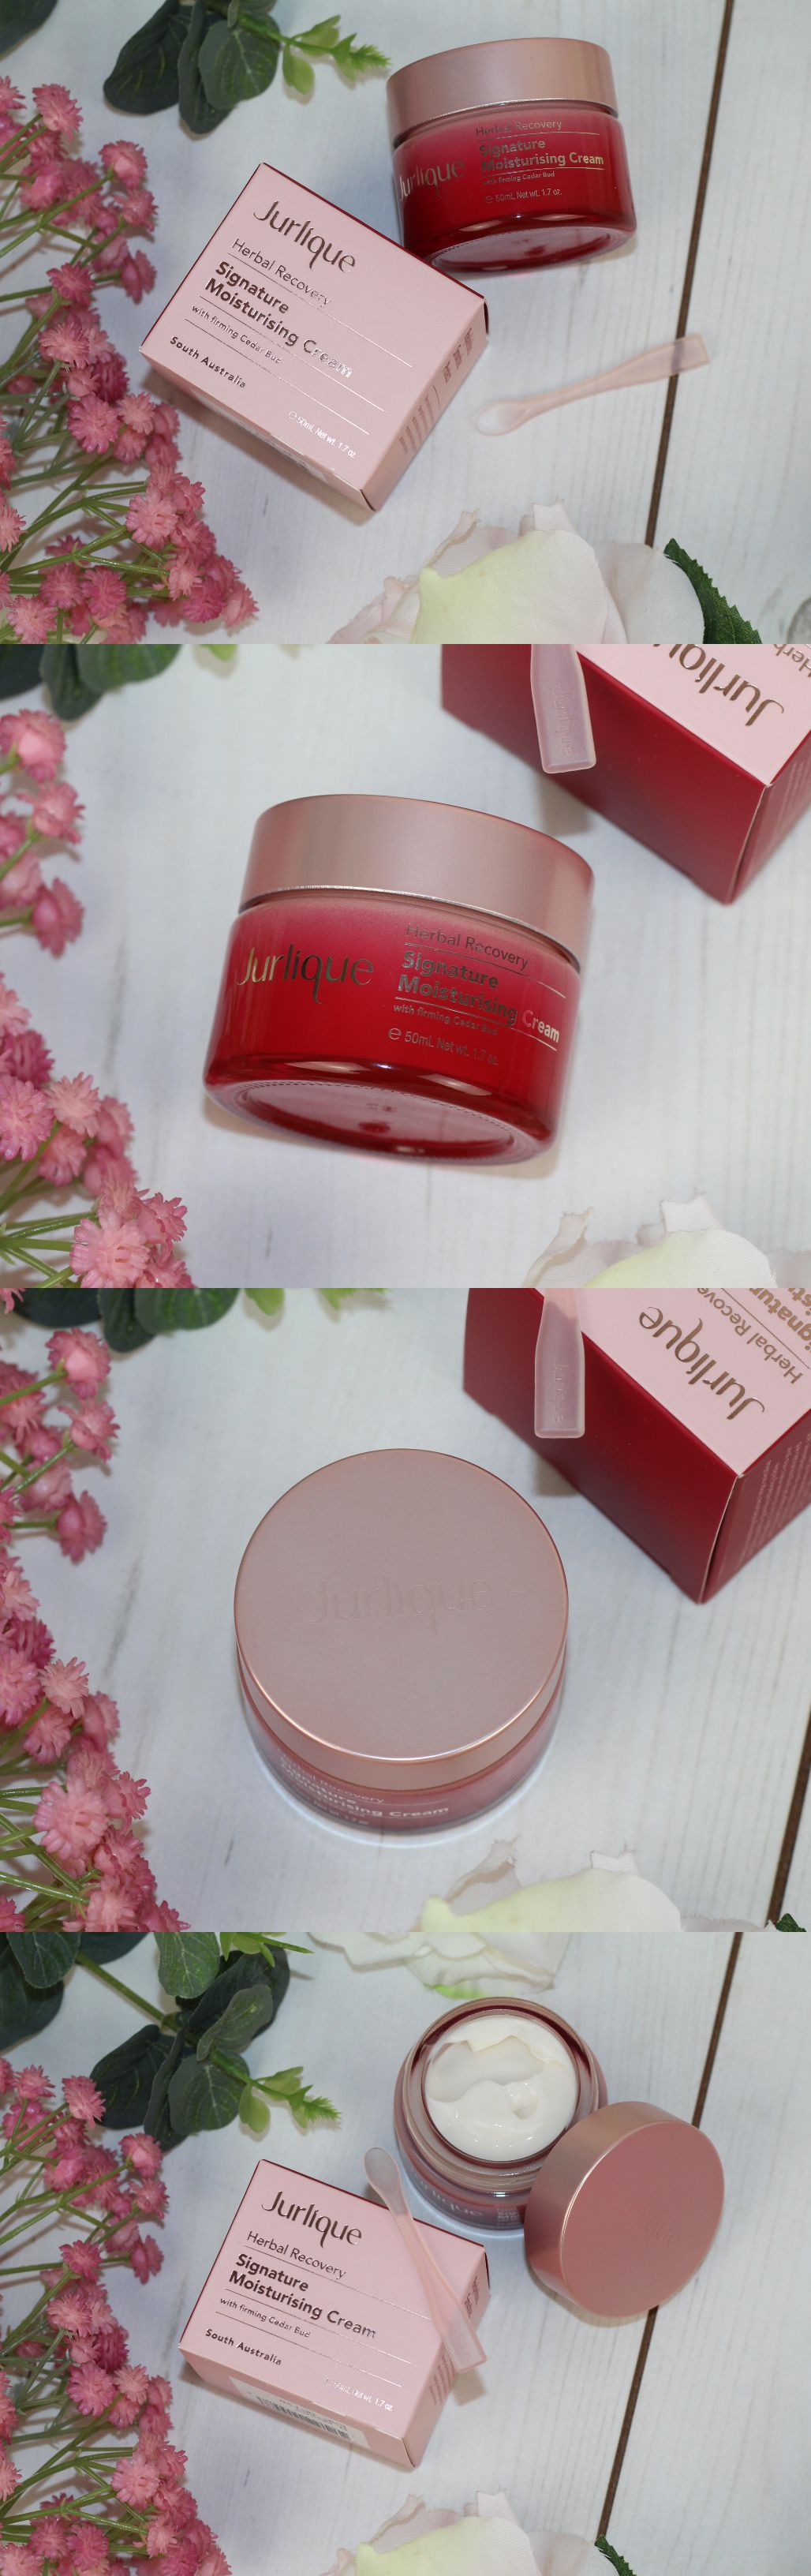 Herbal Recovery Signature Moisturising Cream by jurlique #8